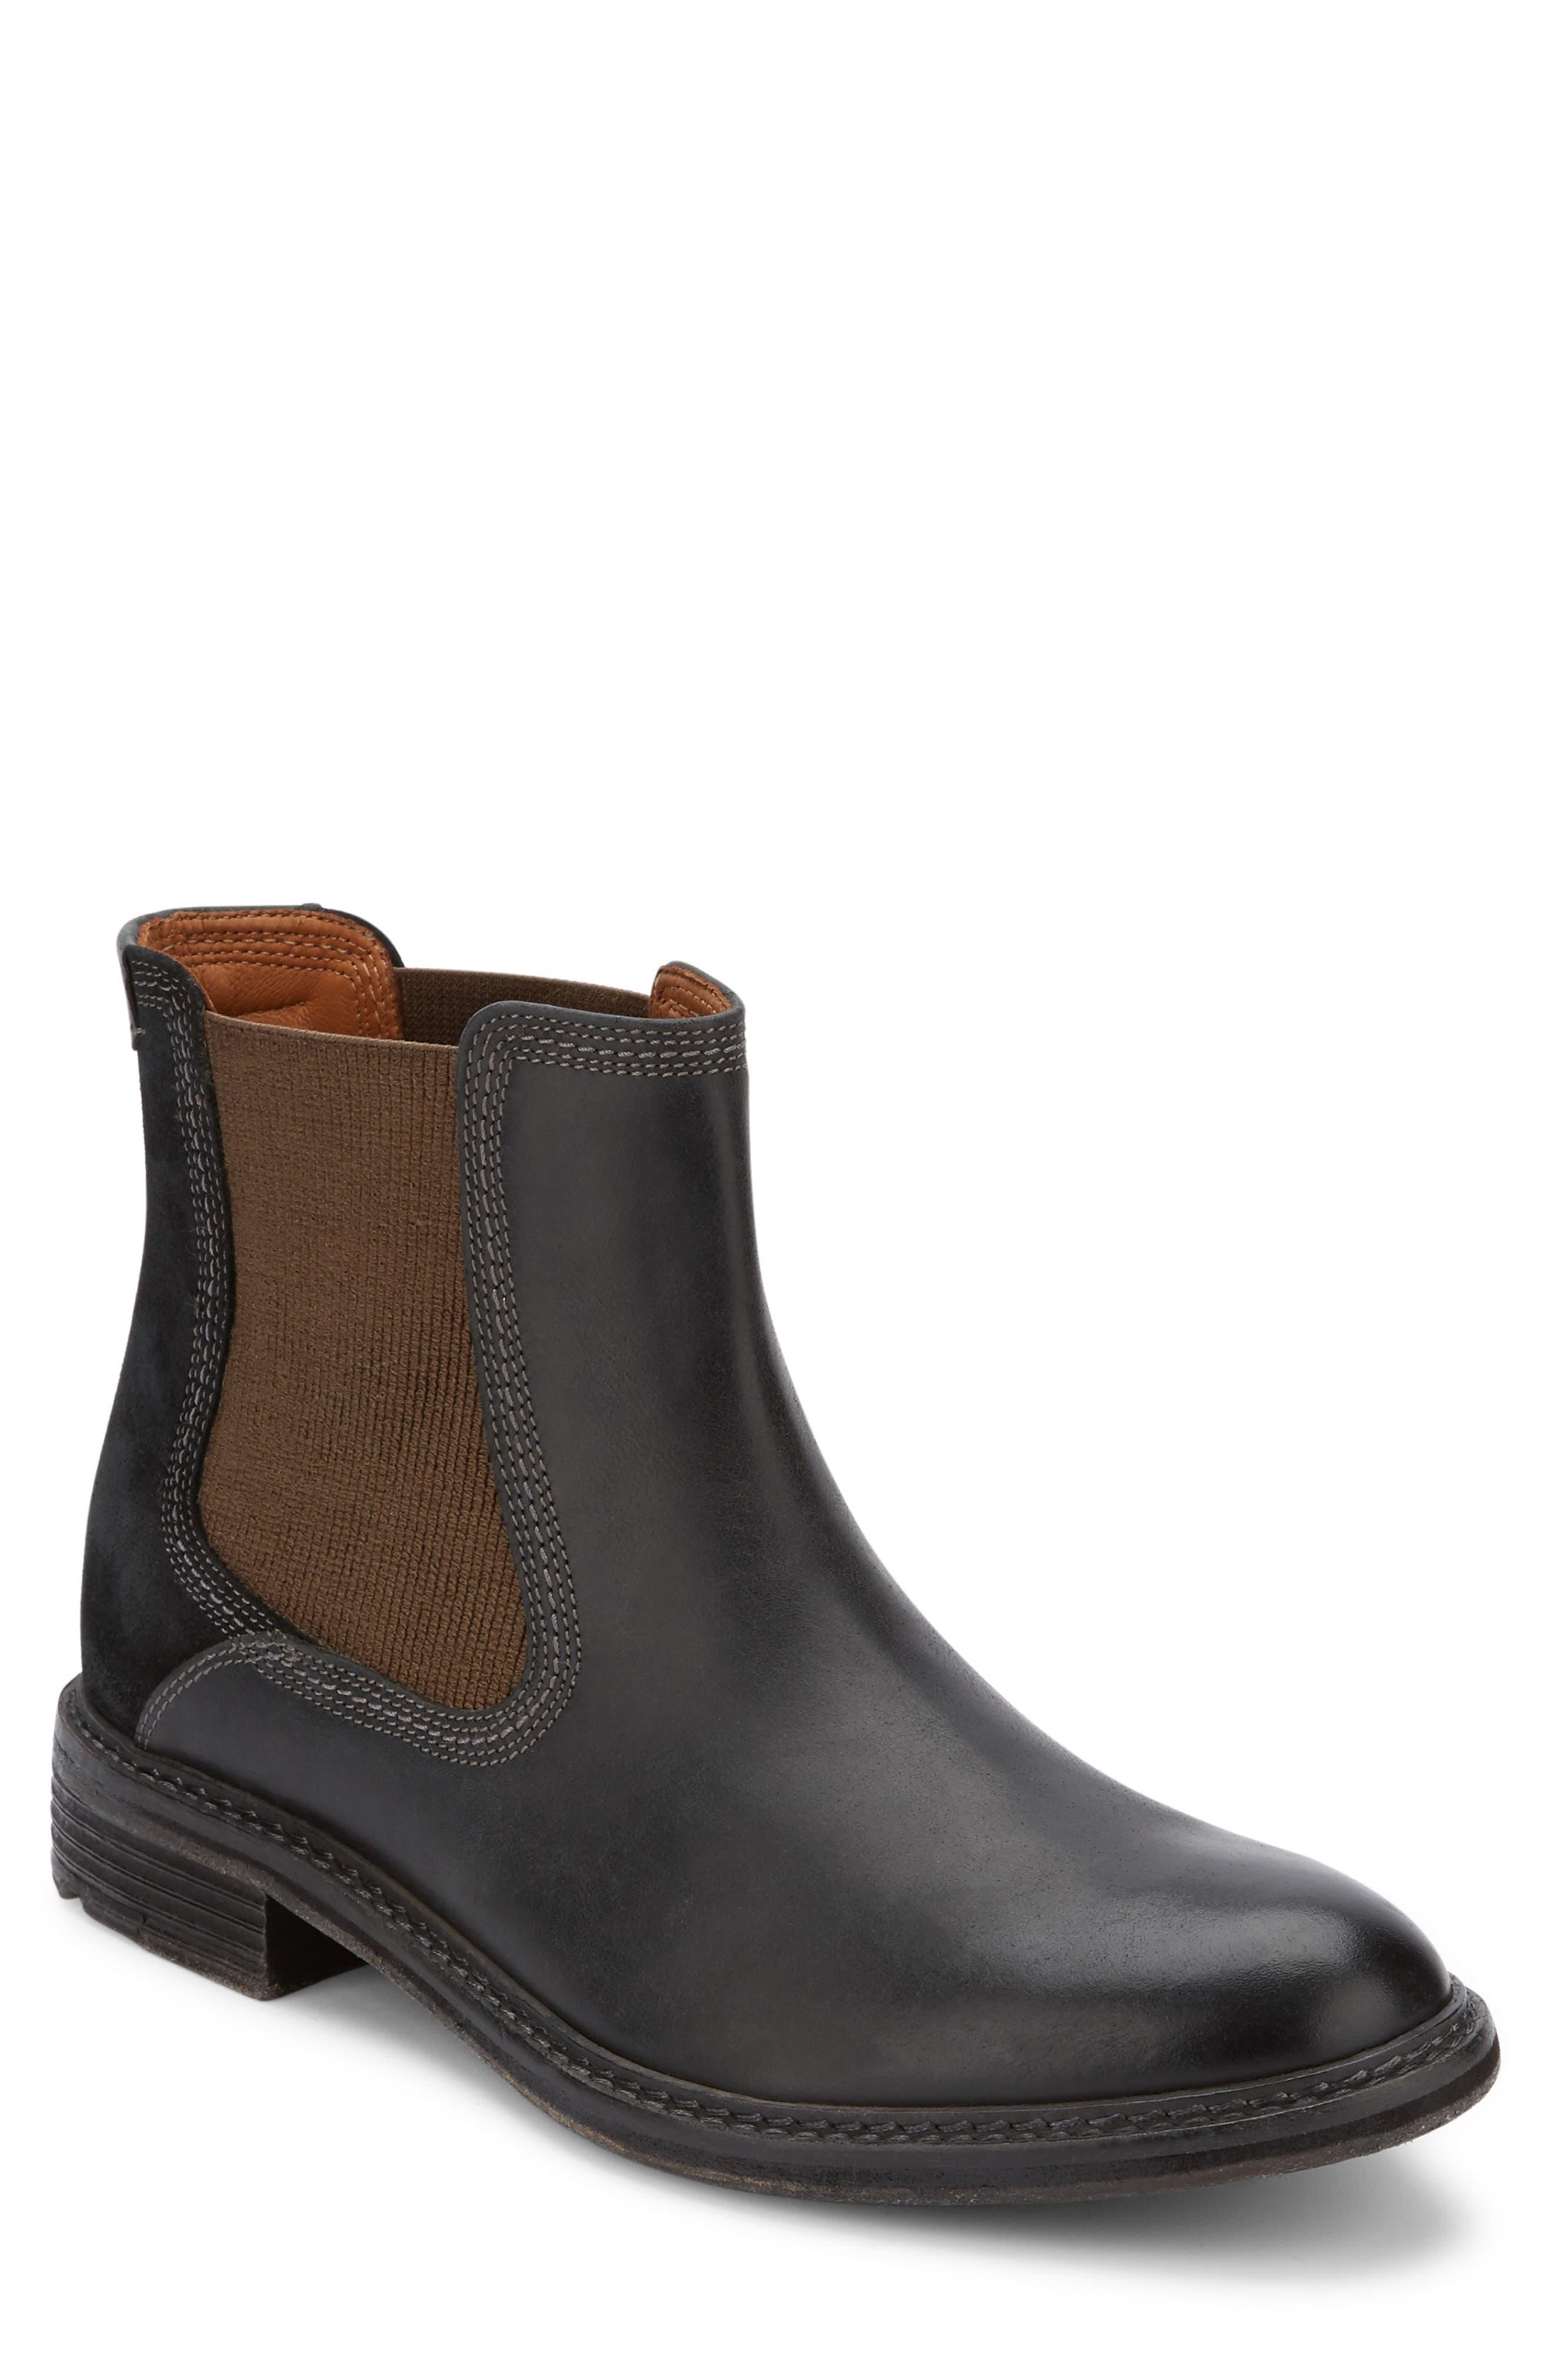 Hendrick Chelsea Boot,                         Main,                         color,